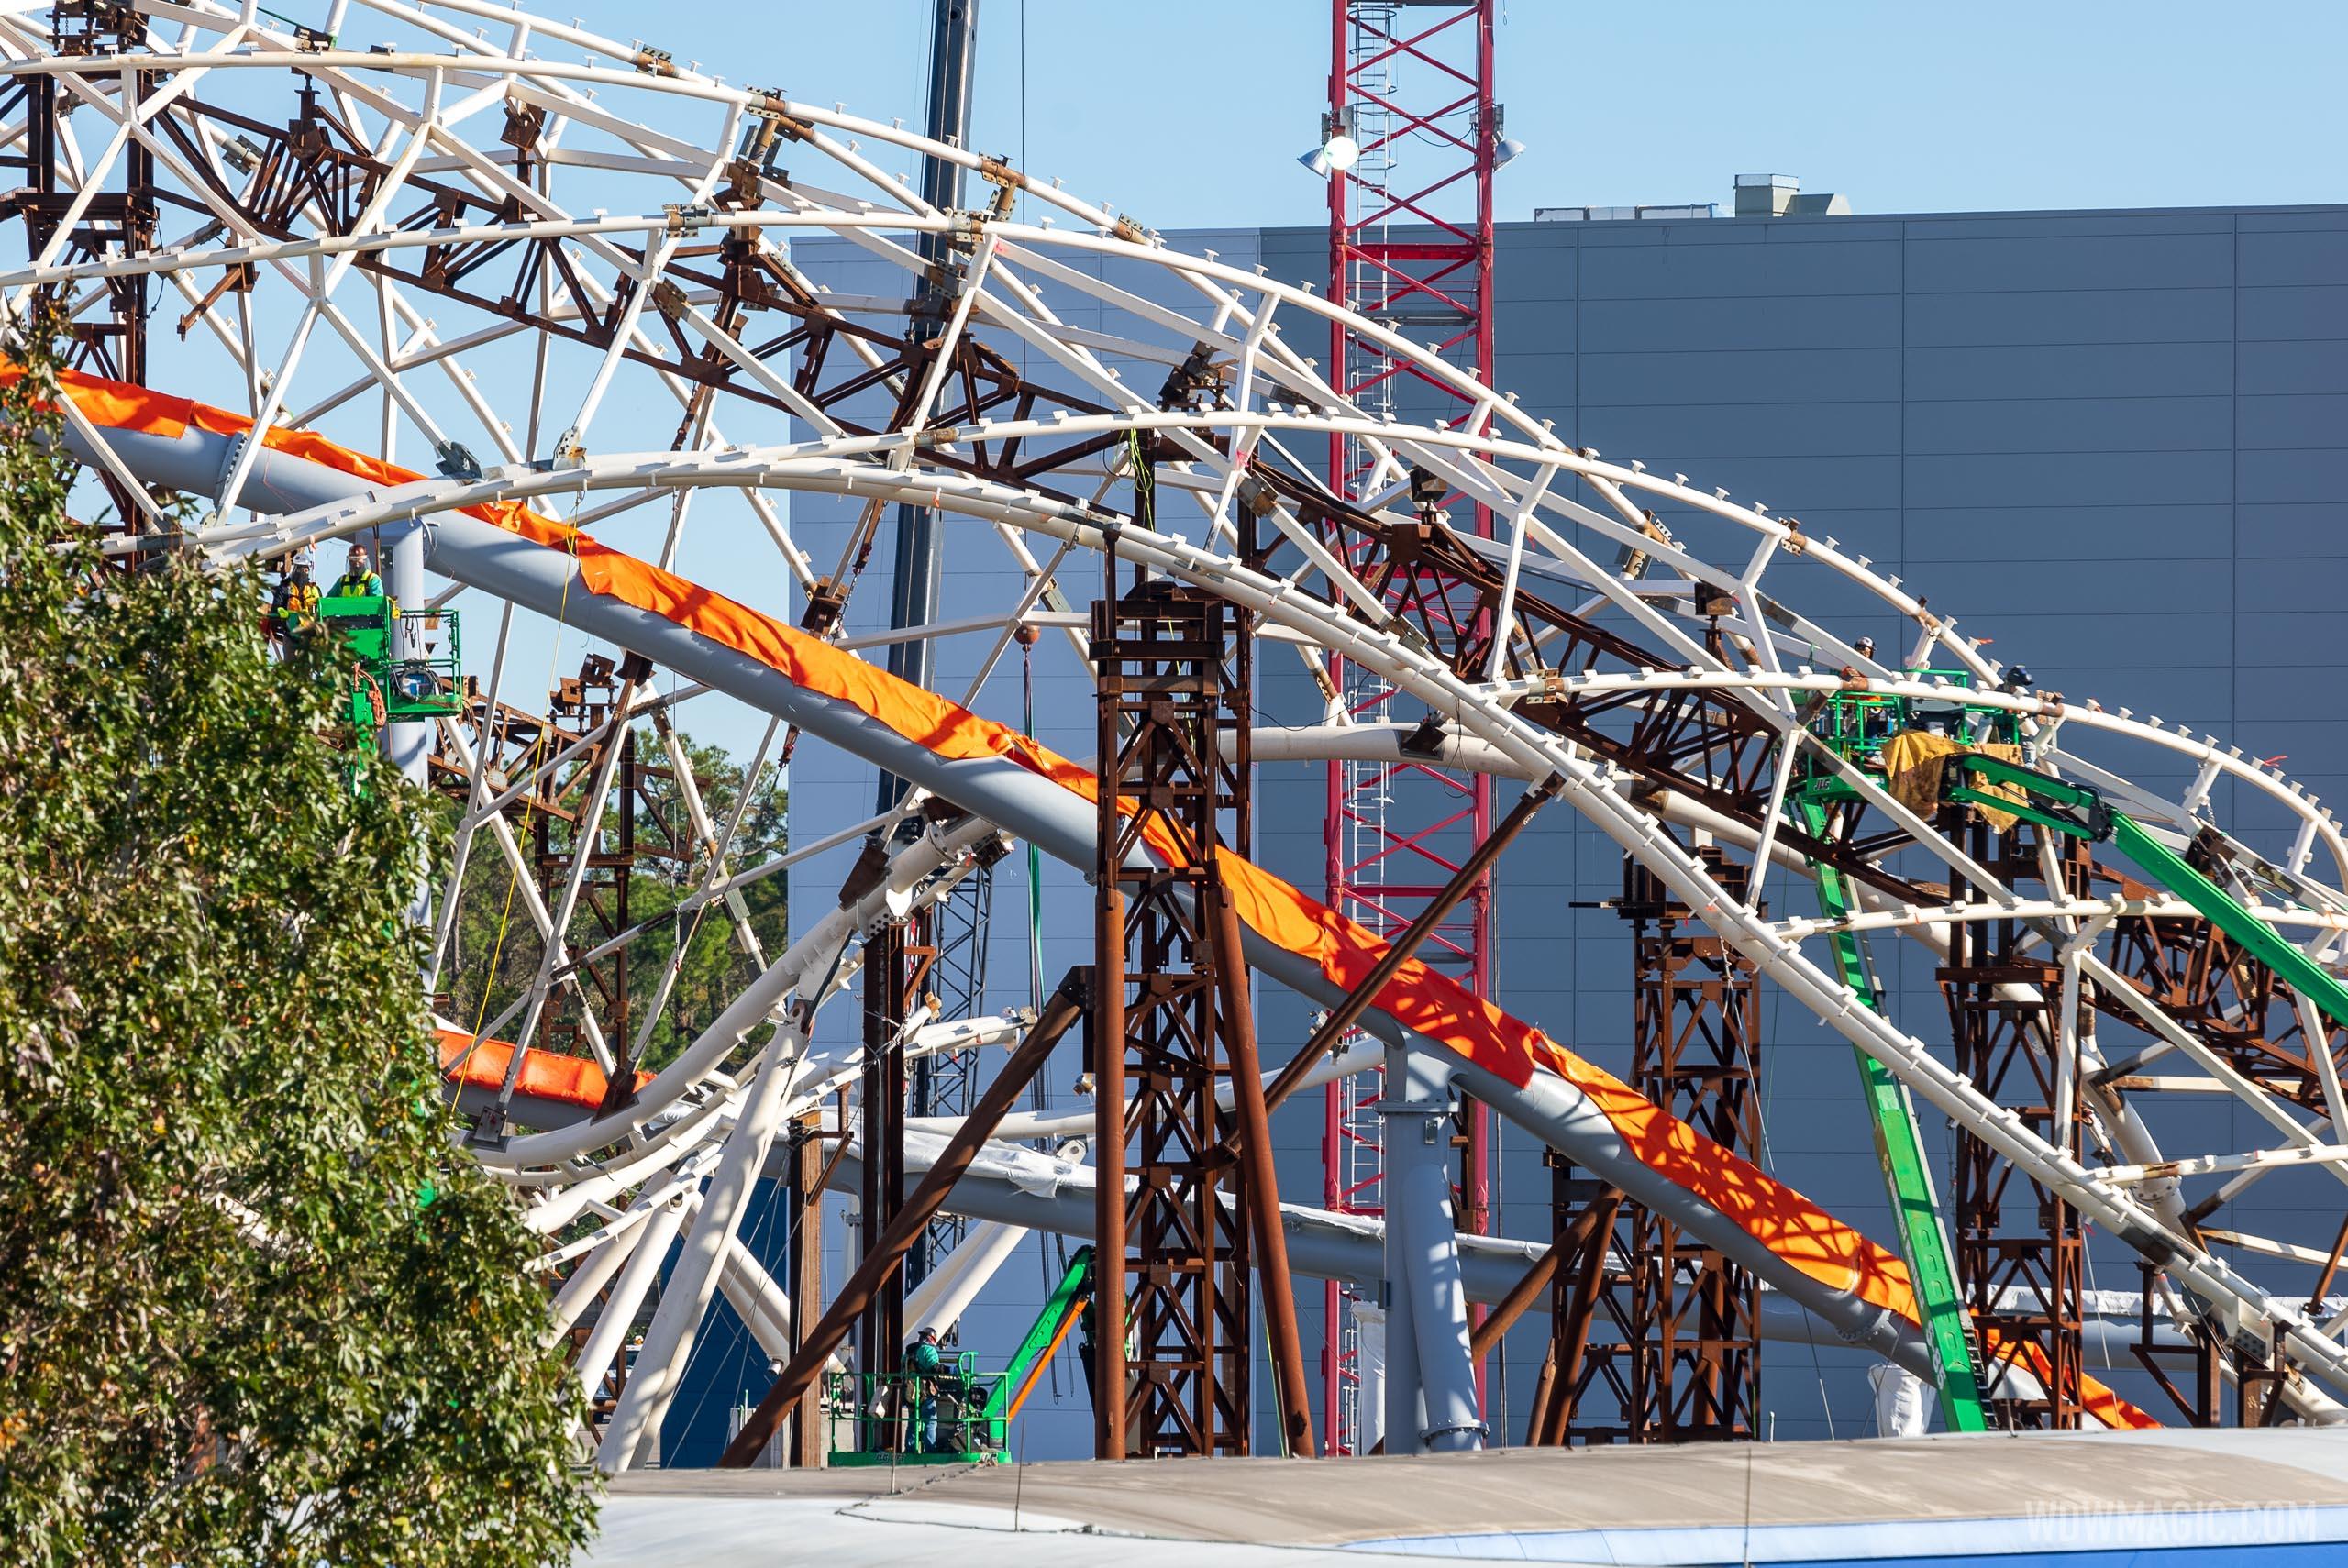 TRON Lightcycle Run construction - December 2 2020